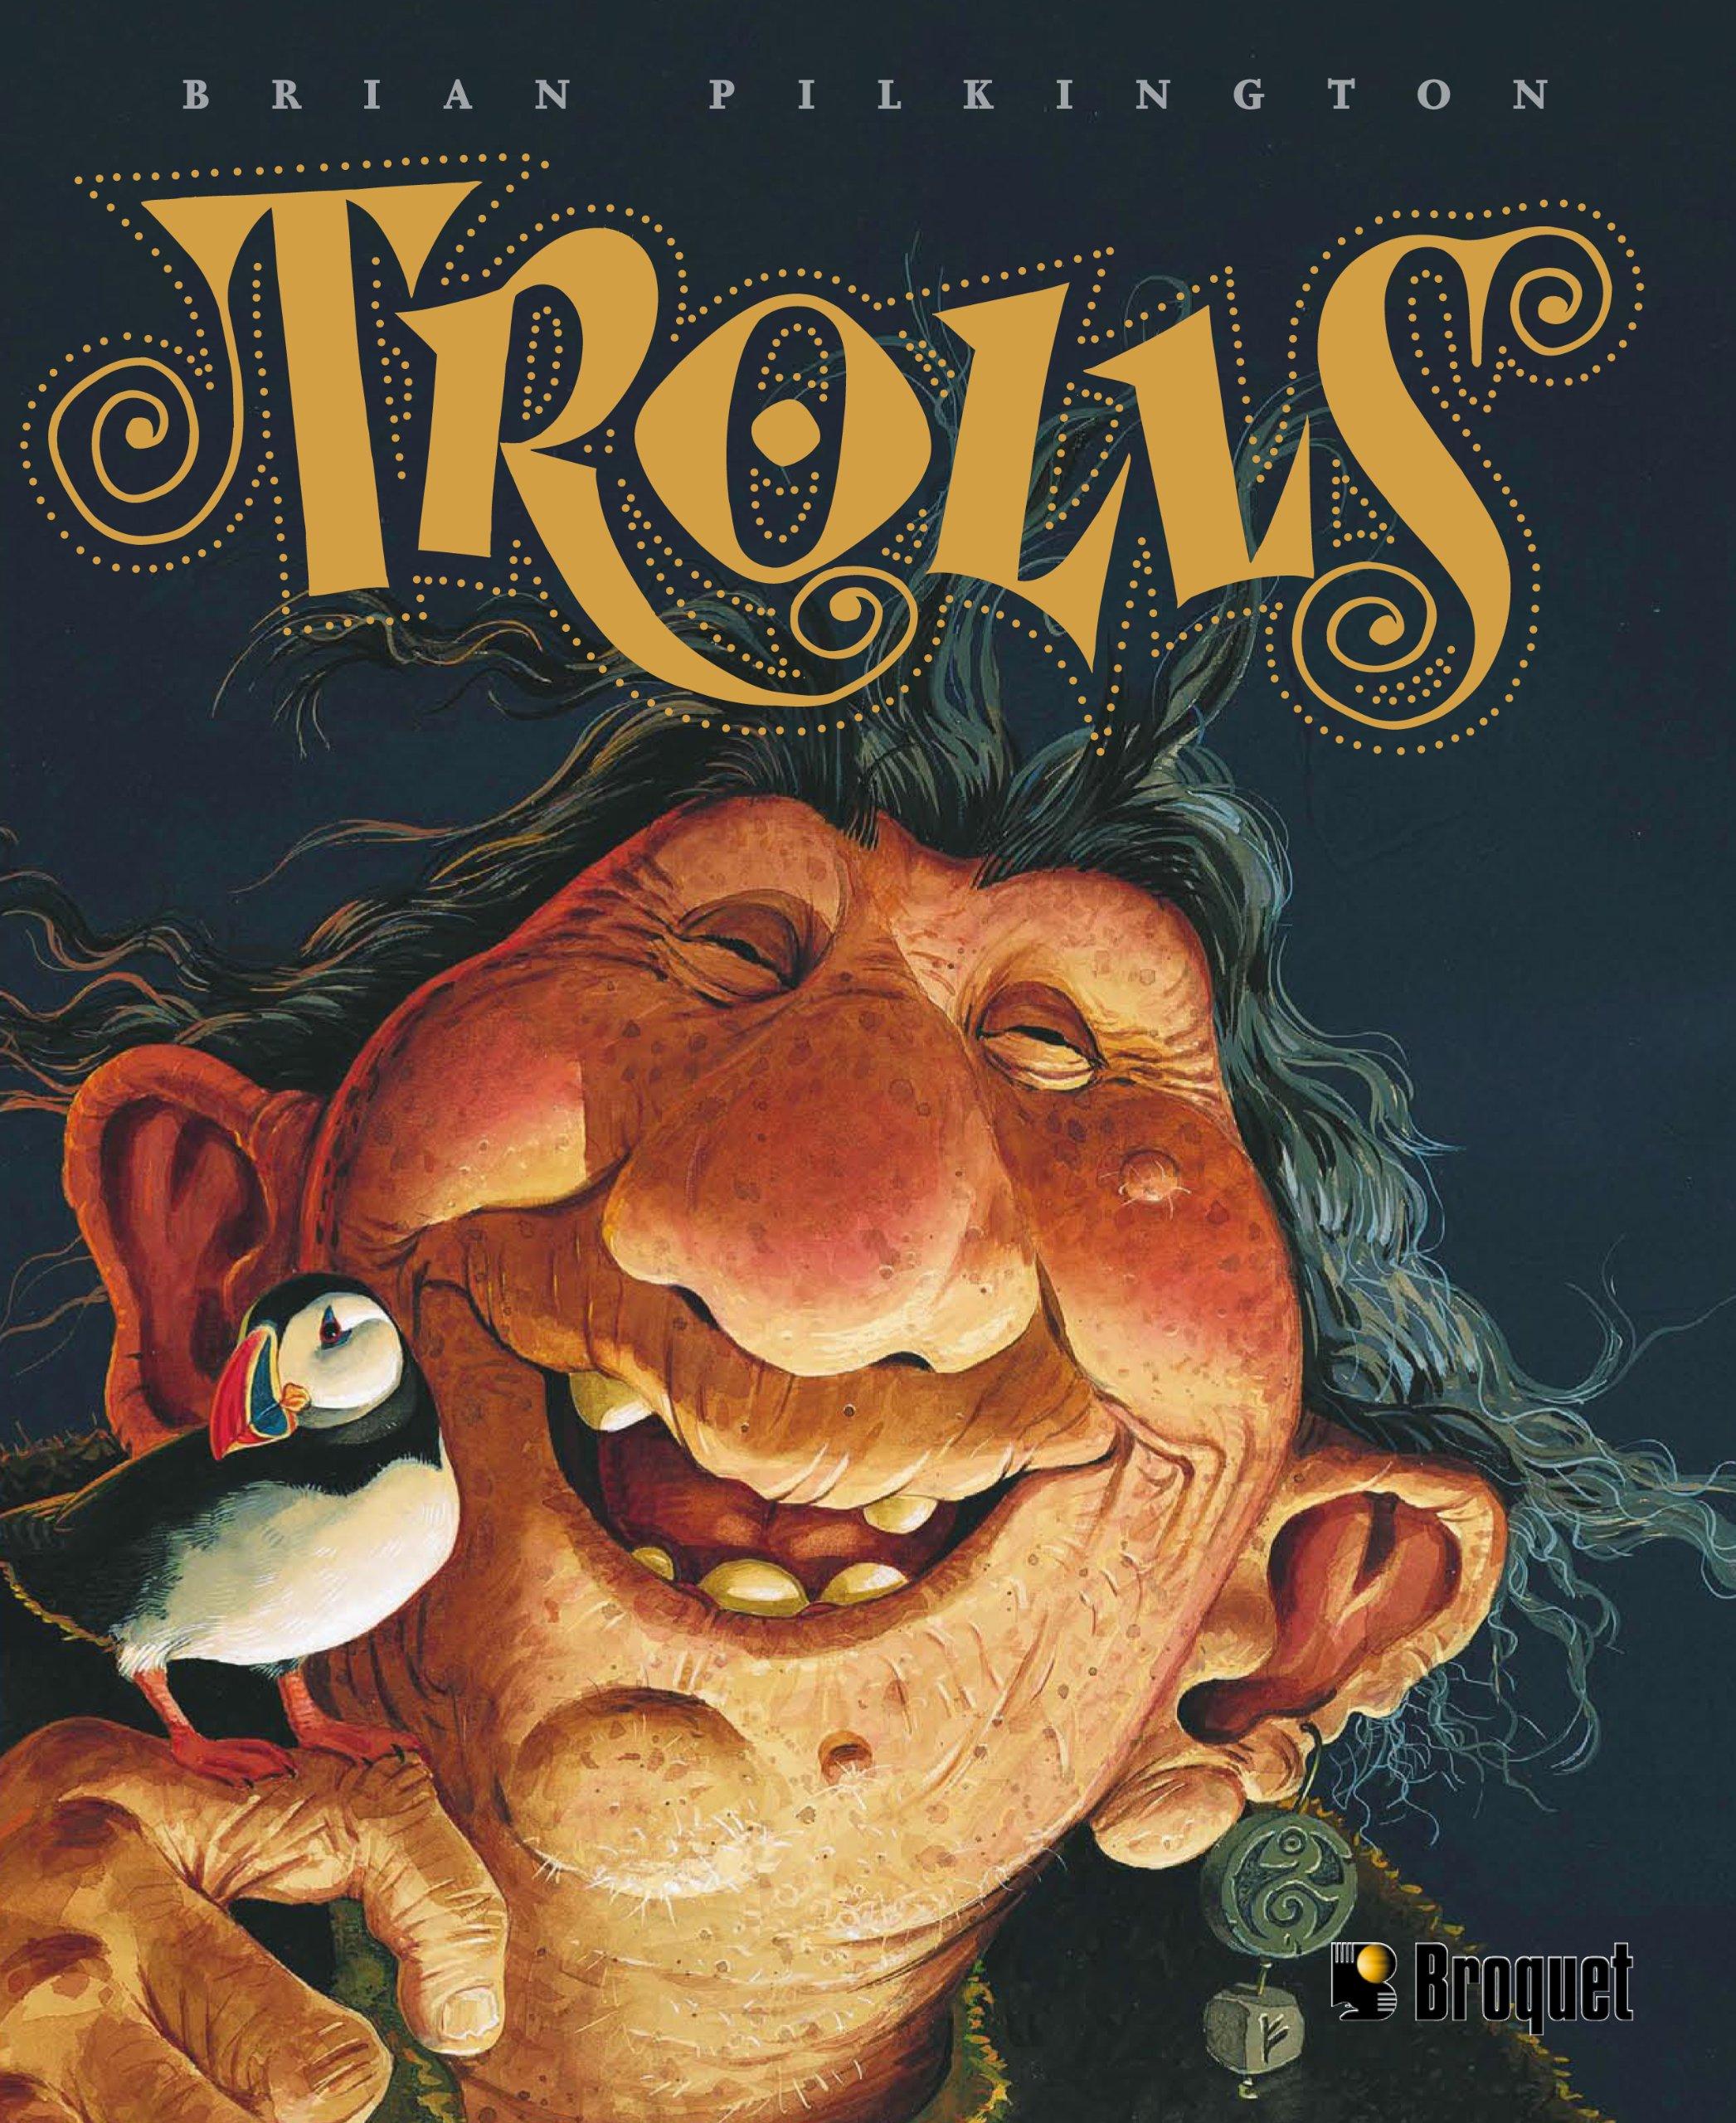 Trolls Album – 12 janvier 2009 Brian Pilkington Terry Gunnell Henri Pradin Broquet Inc